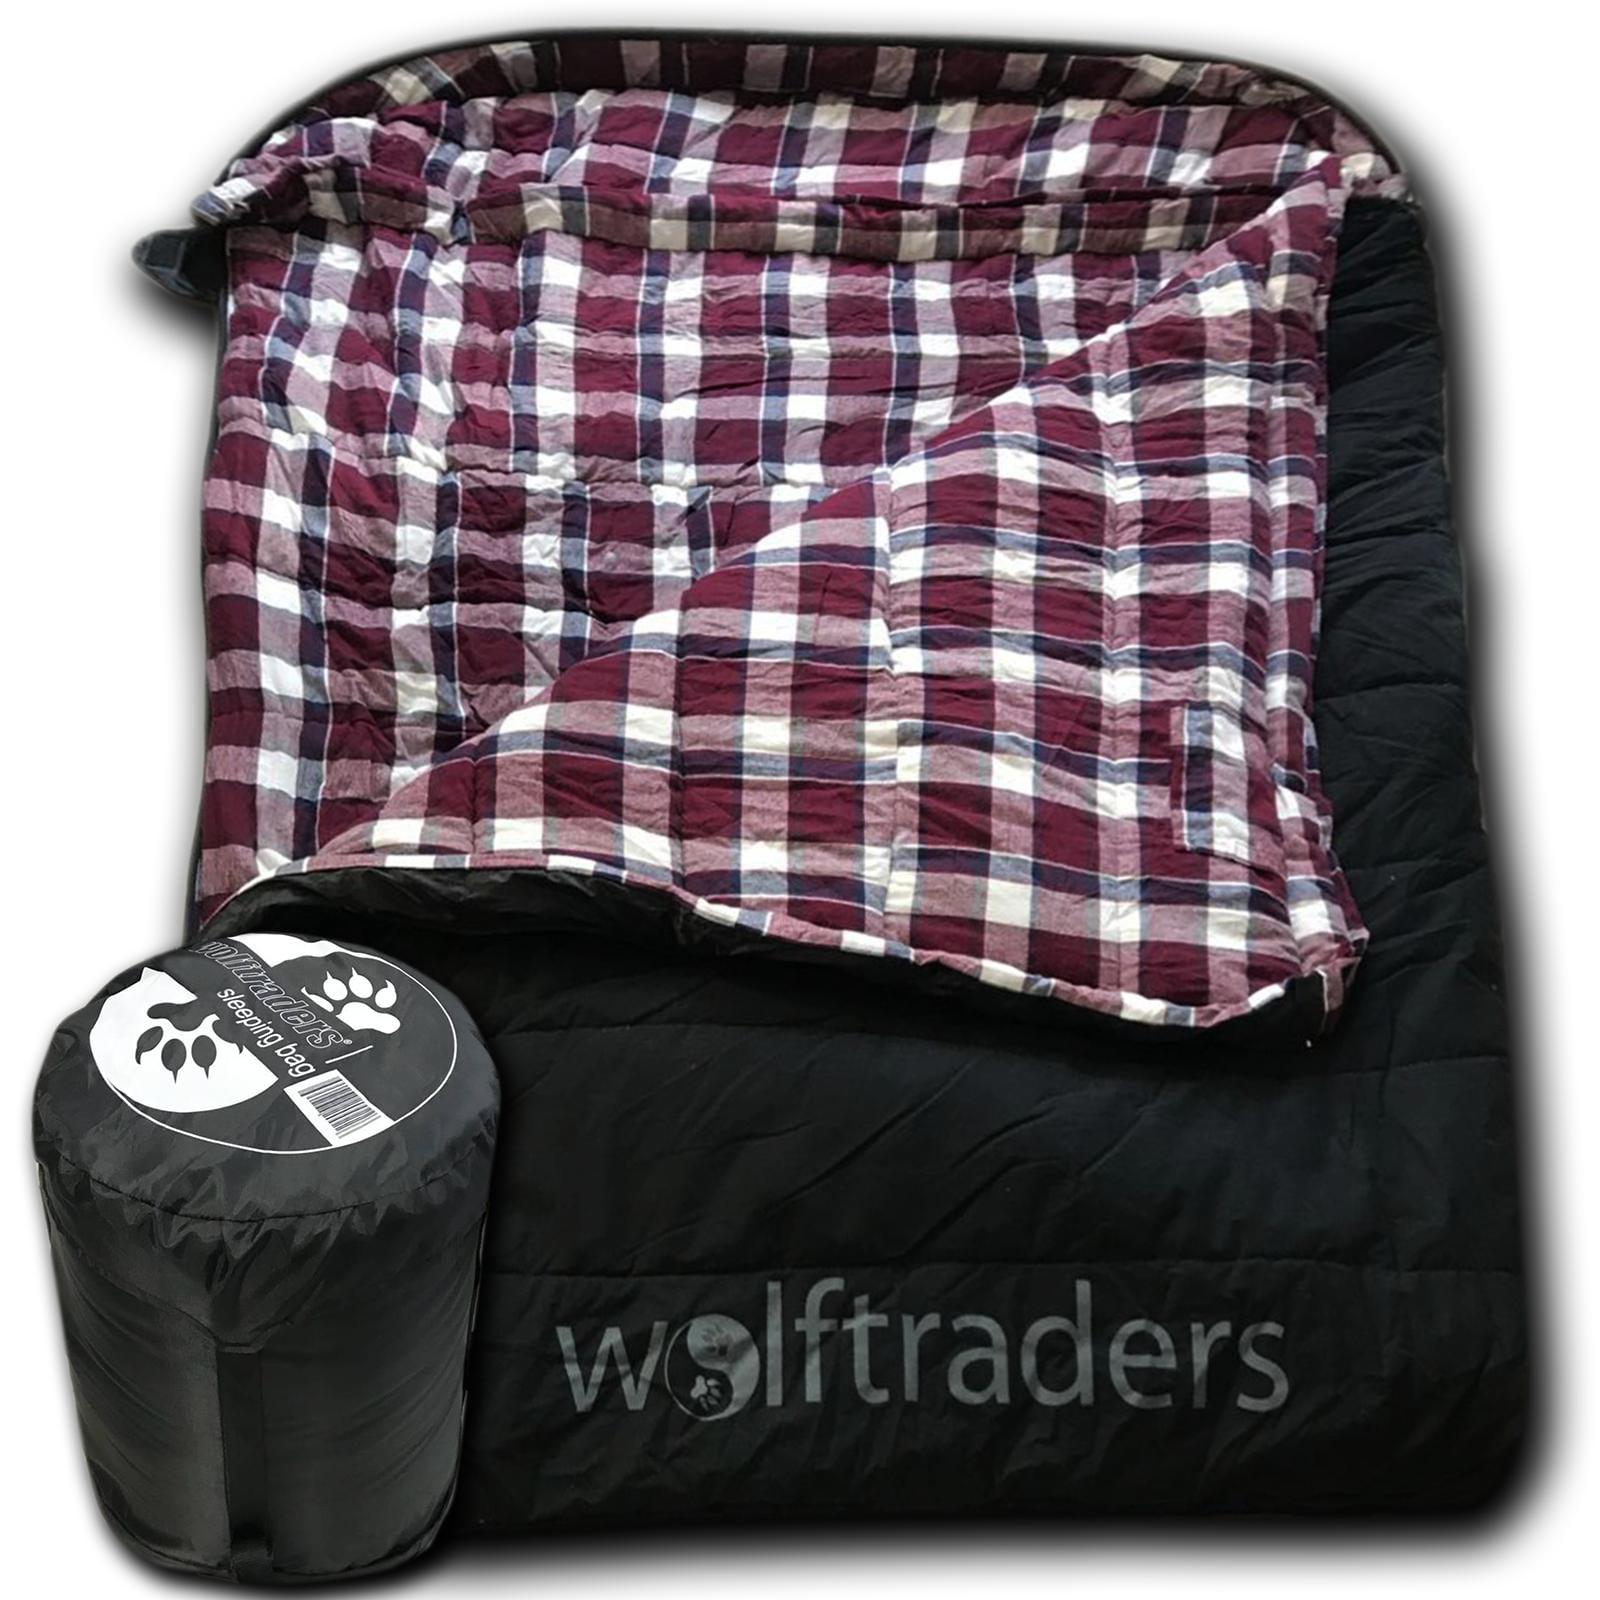 Wolftraders TwoWolves +0 Degree 2-Person Premium Canvas Sleeping Bag, Black/Purple